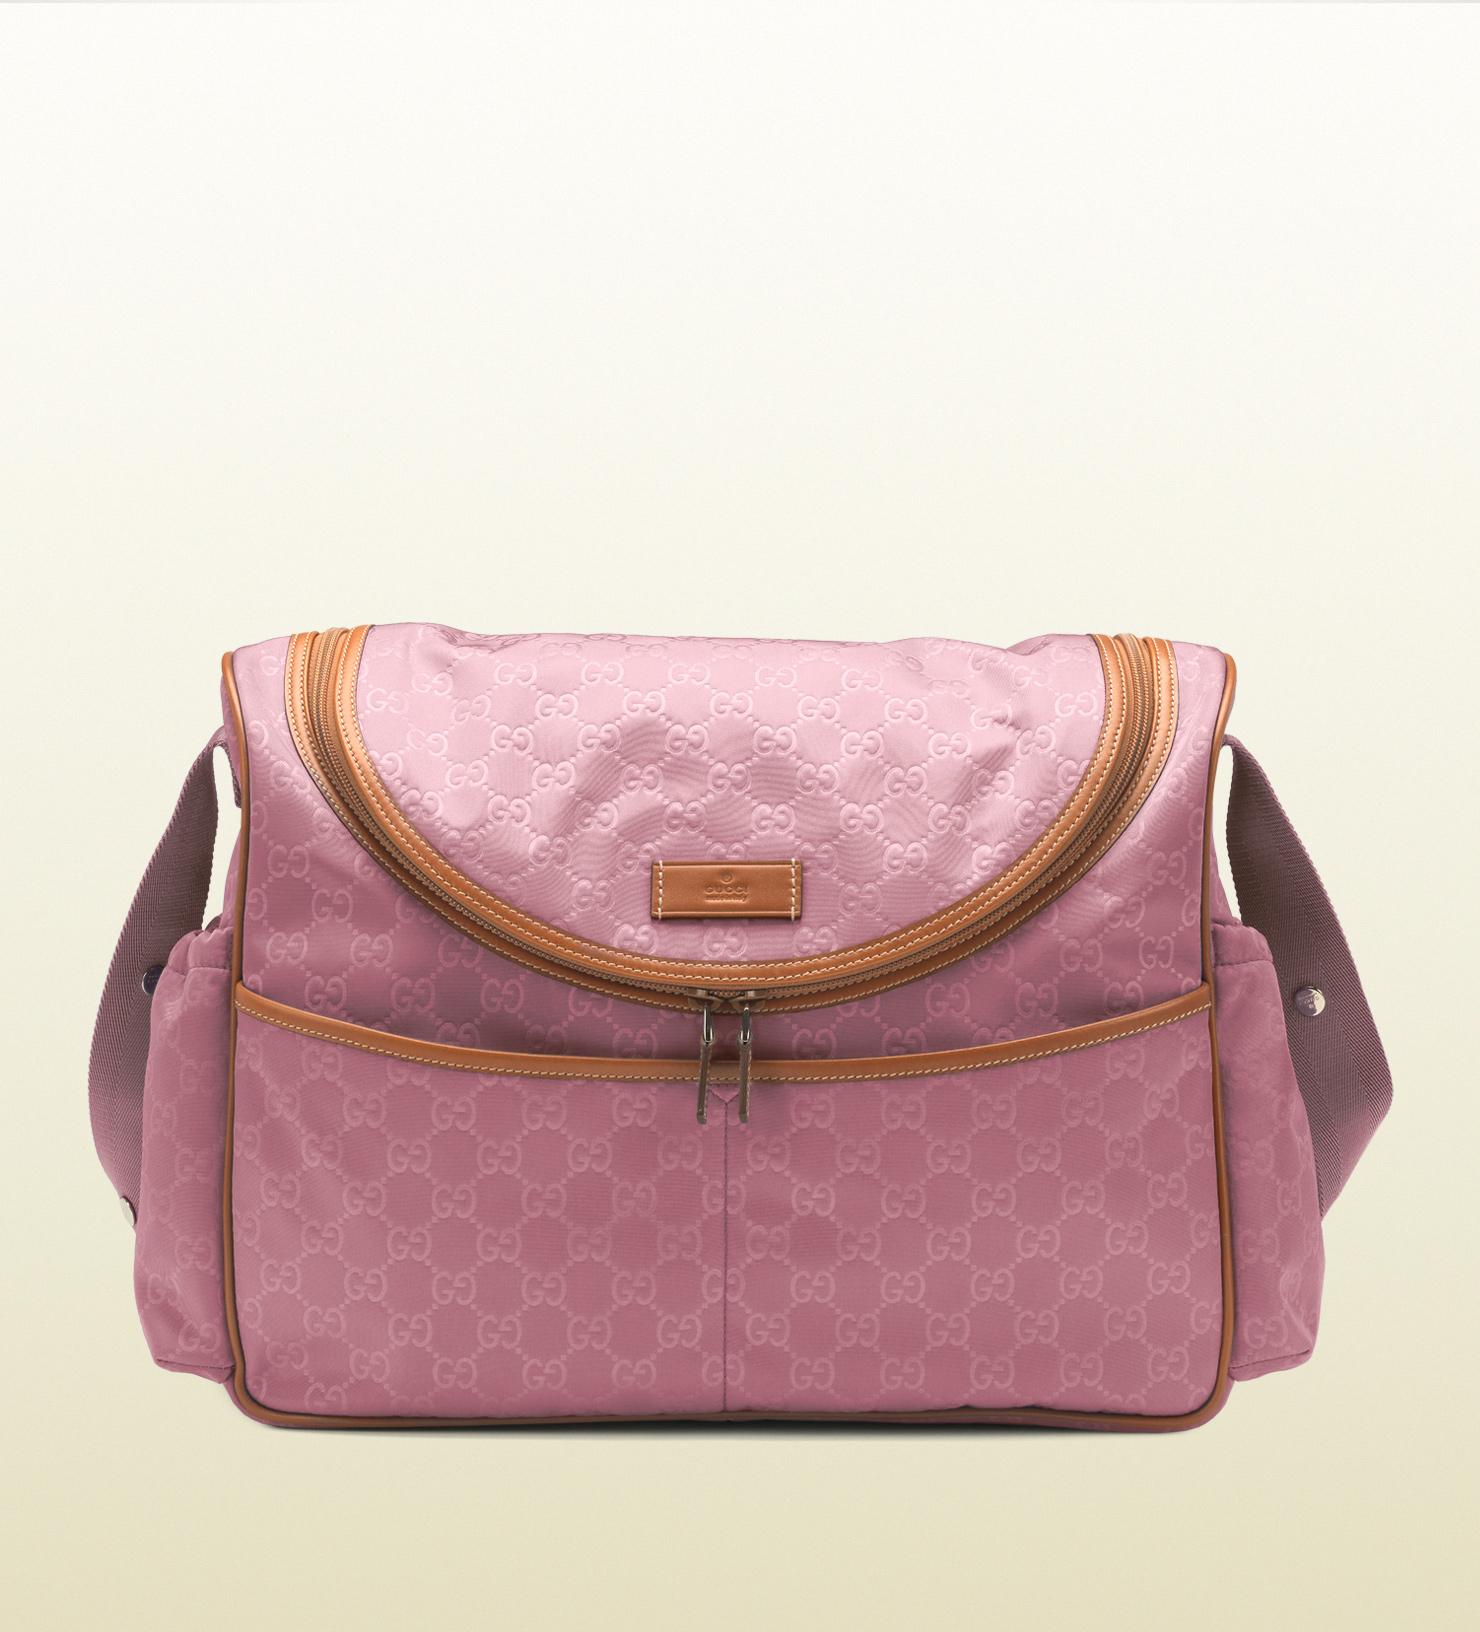 Lyst - Gucci Dark Pink Nylon Guccissima Diaper Bag in Pink